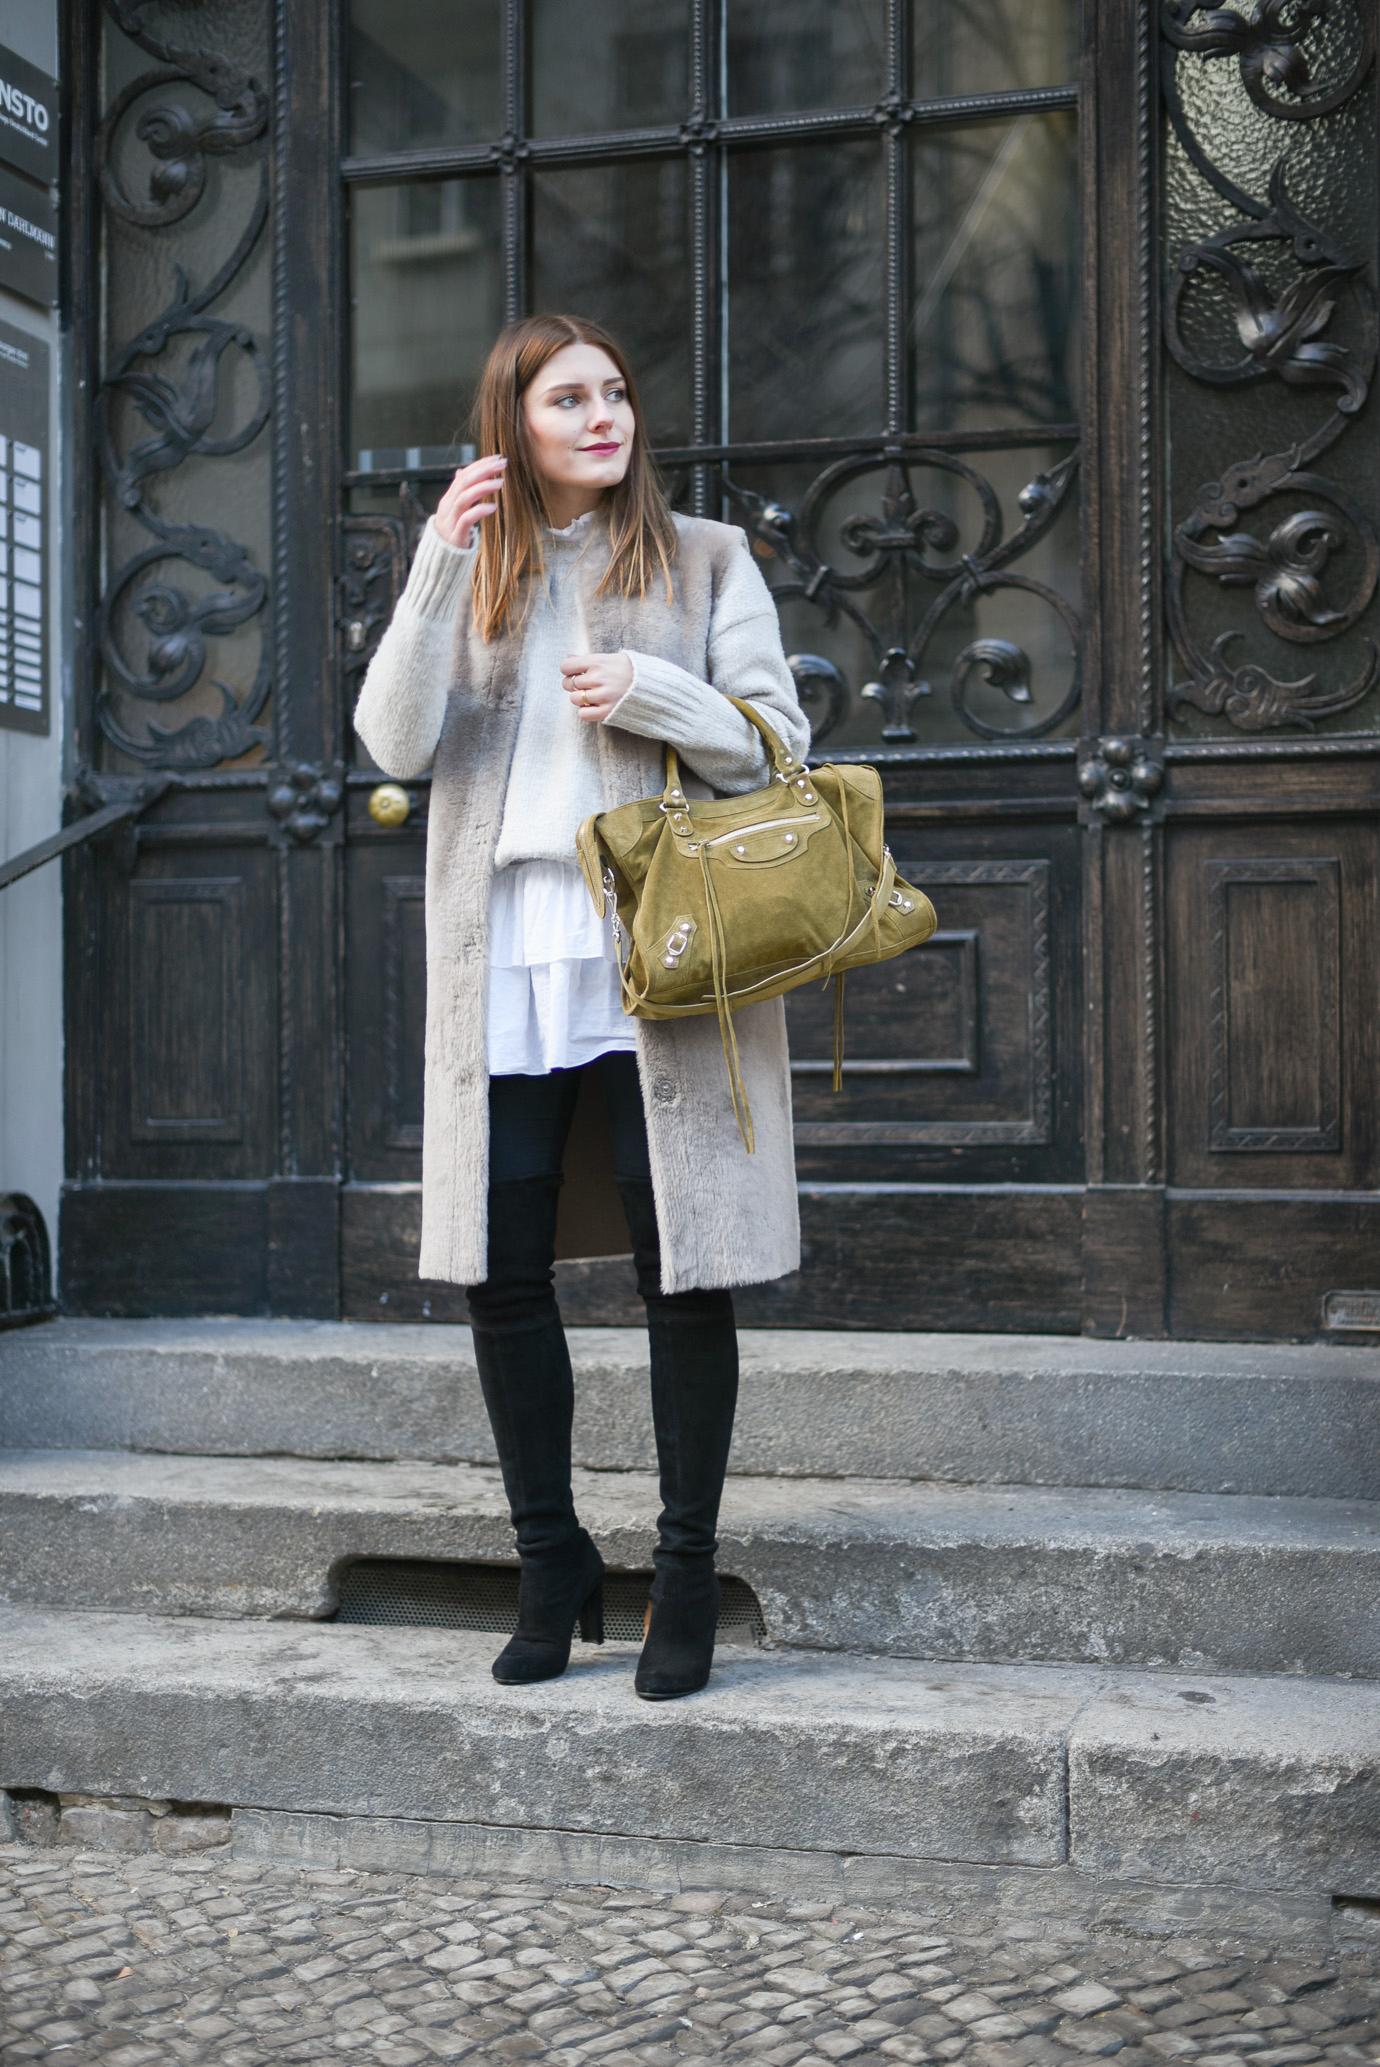 Berlin_Fashion_Week_Outfit_1